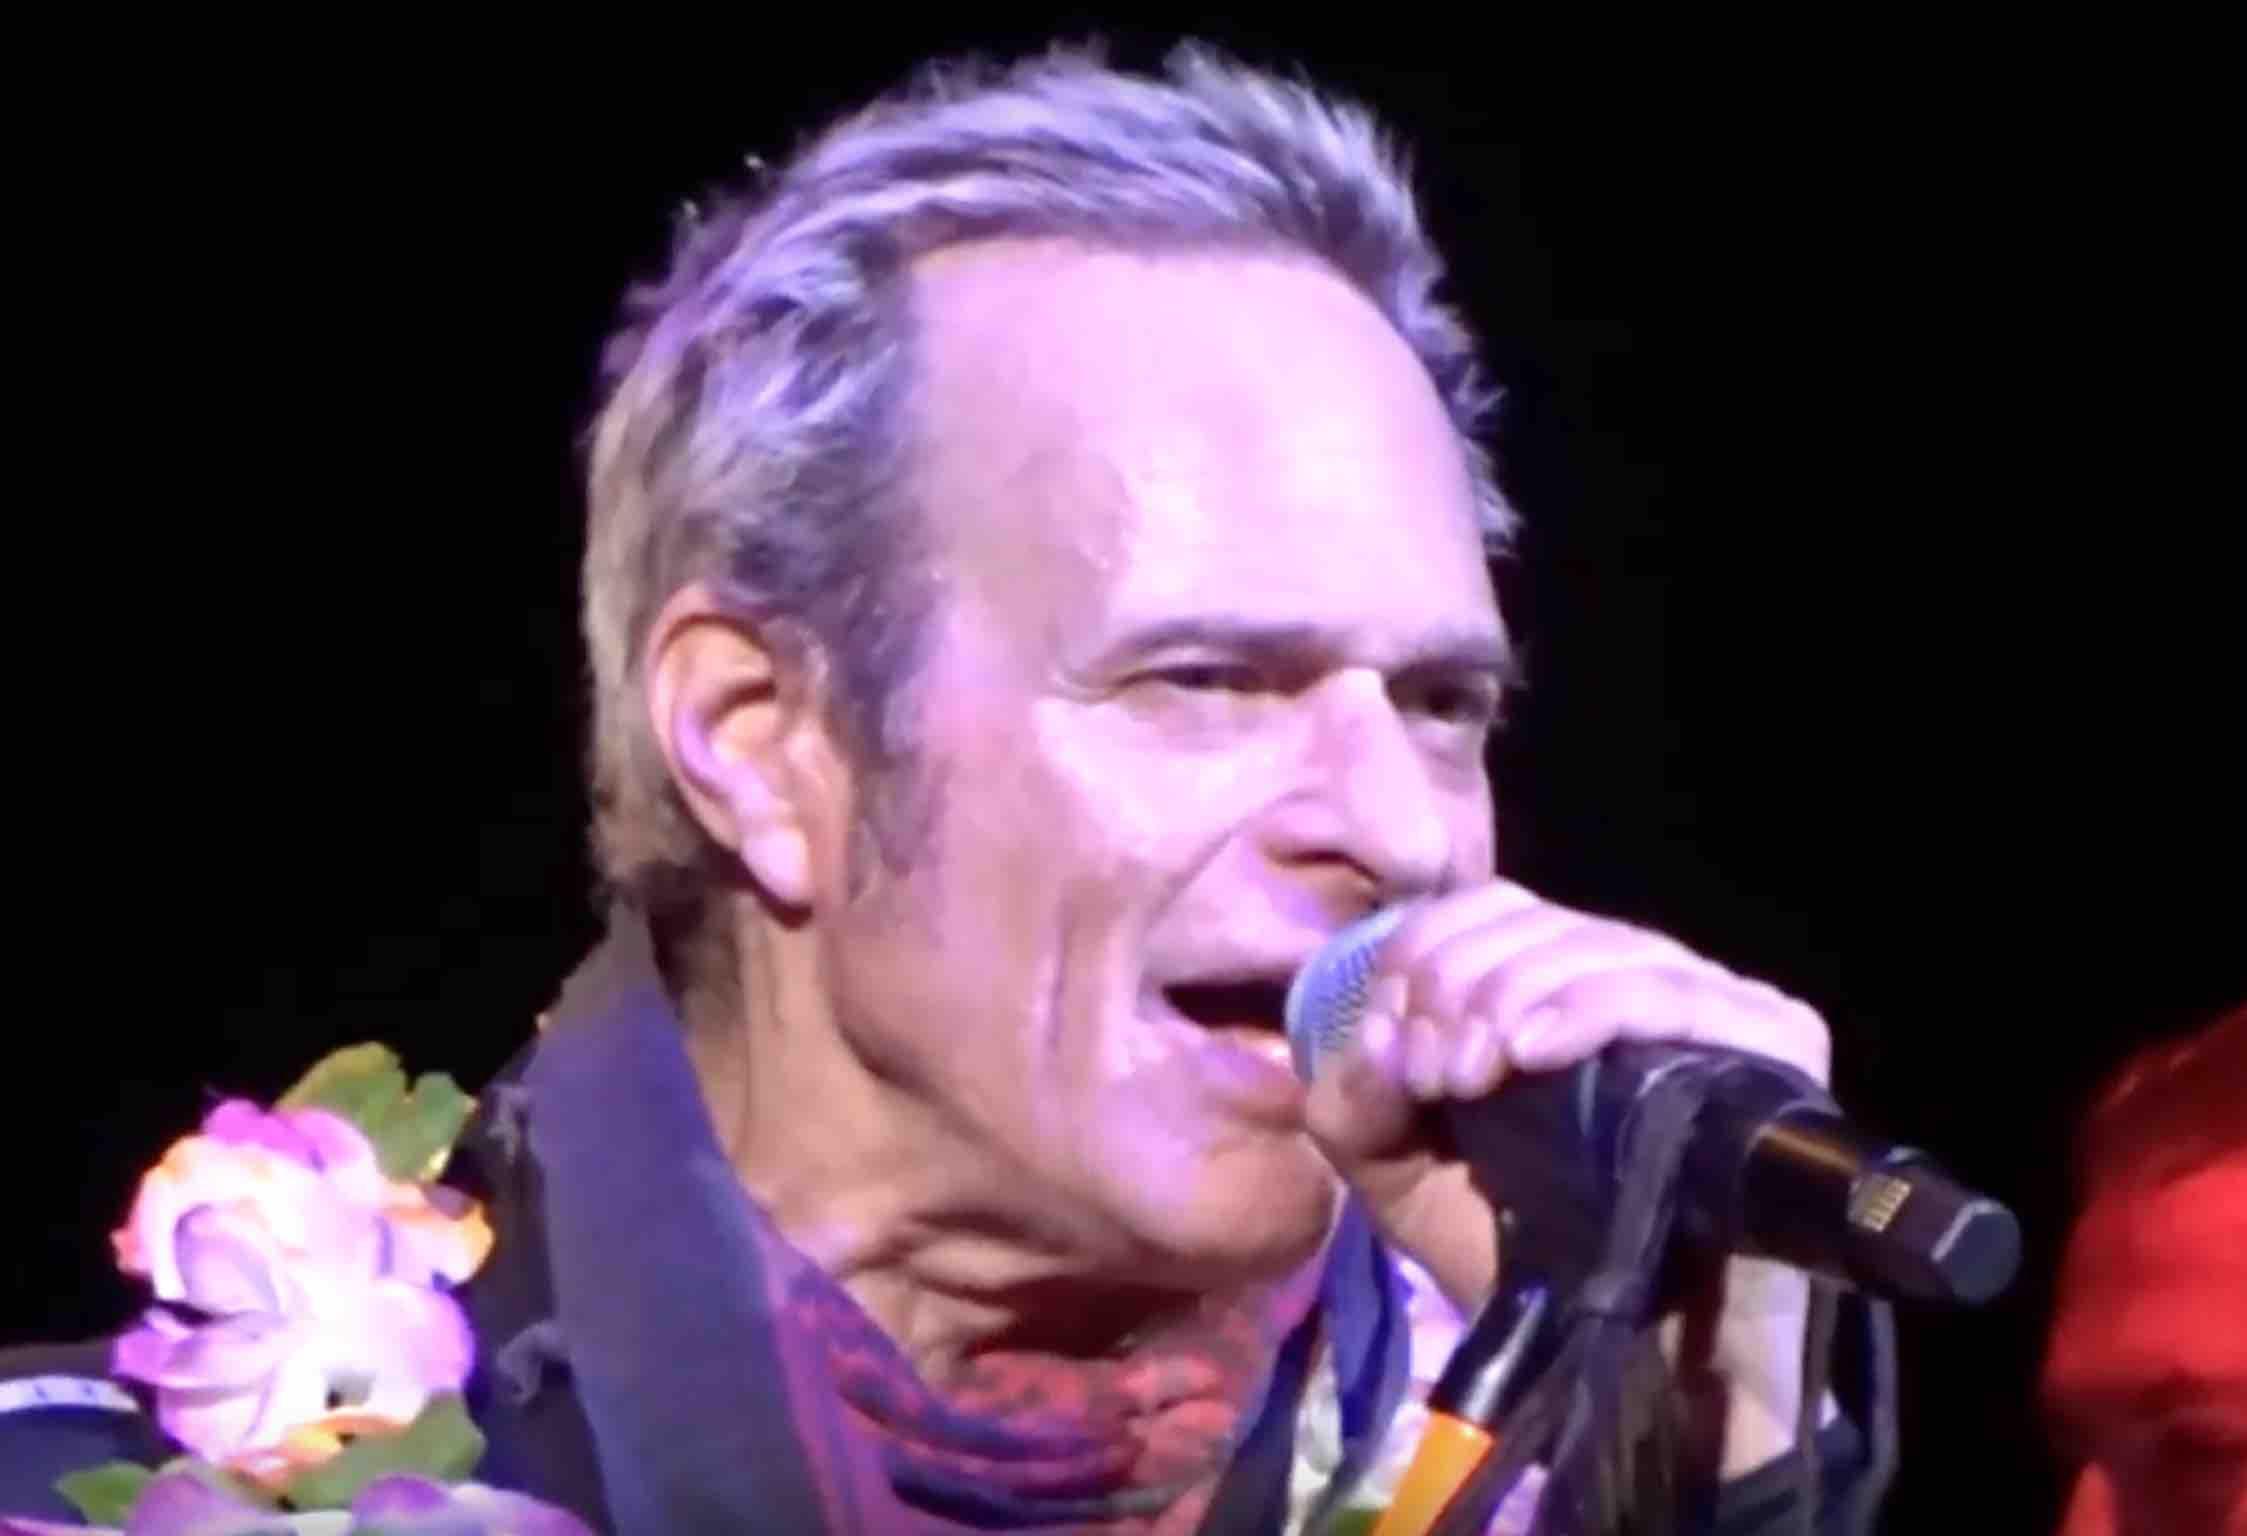 David Lee Roth Announces New Singer To Van Halen Fans In 2020 Van Halen David Lee Roth Singer